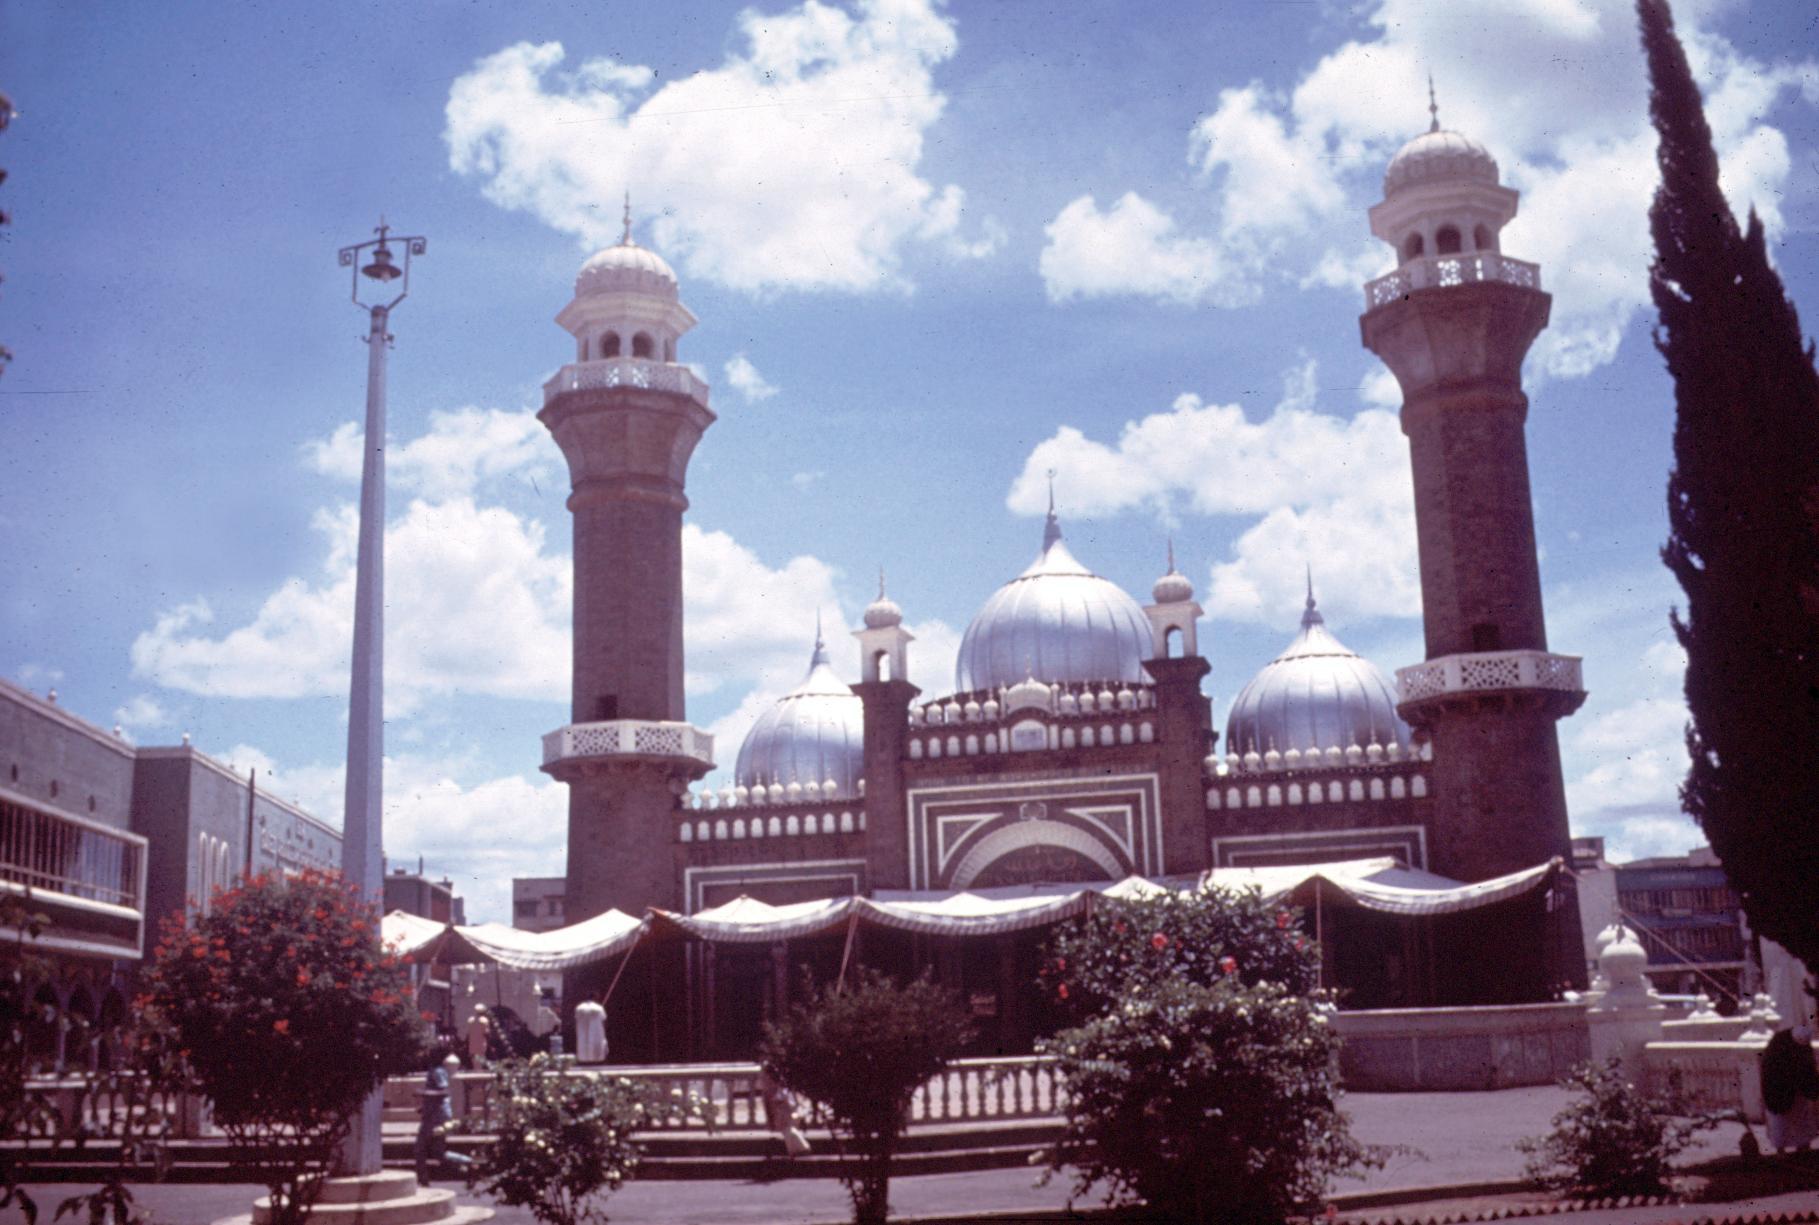 A Mosque in Nairobi